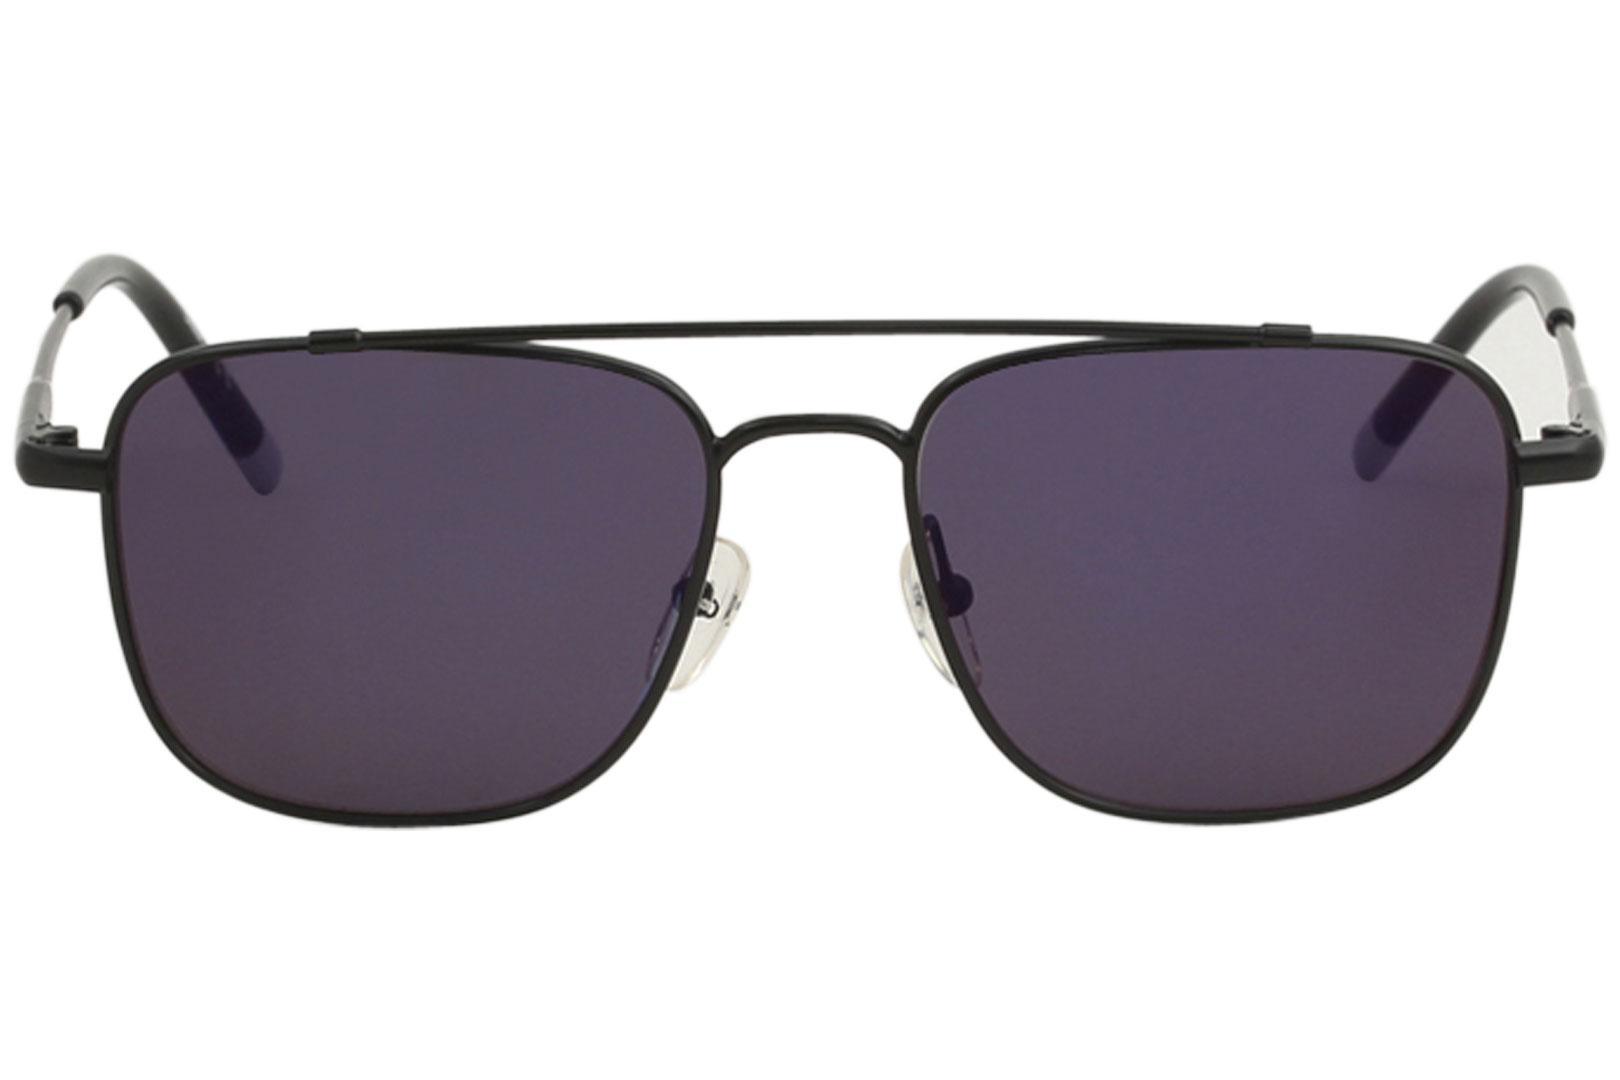 93646f3ce7 Calvin Klein Women s CK2150S CK 2150 S Fashion Pilot Sunglasses by Calvin  Klein. 1234